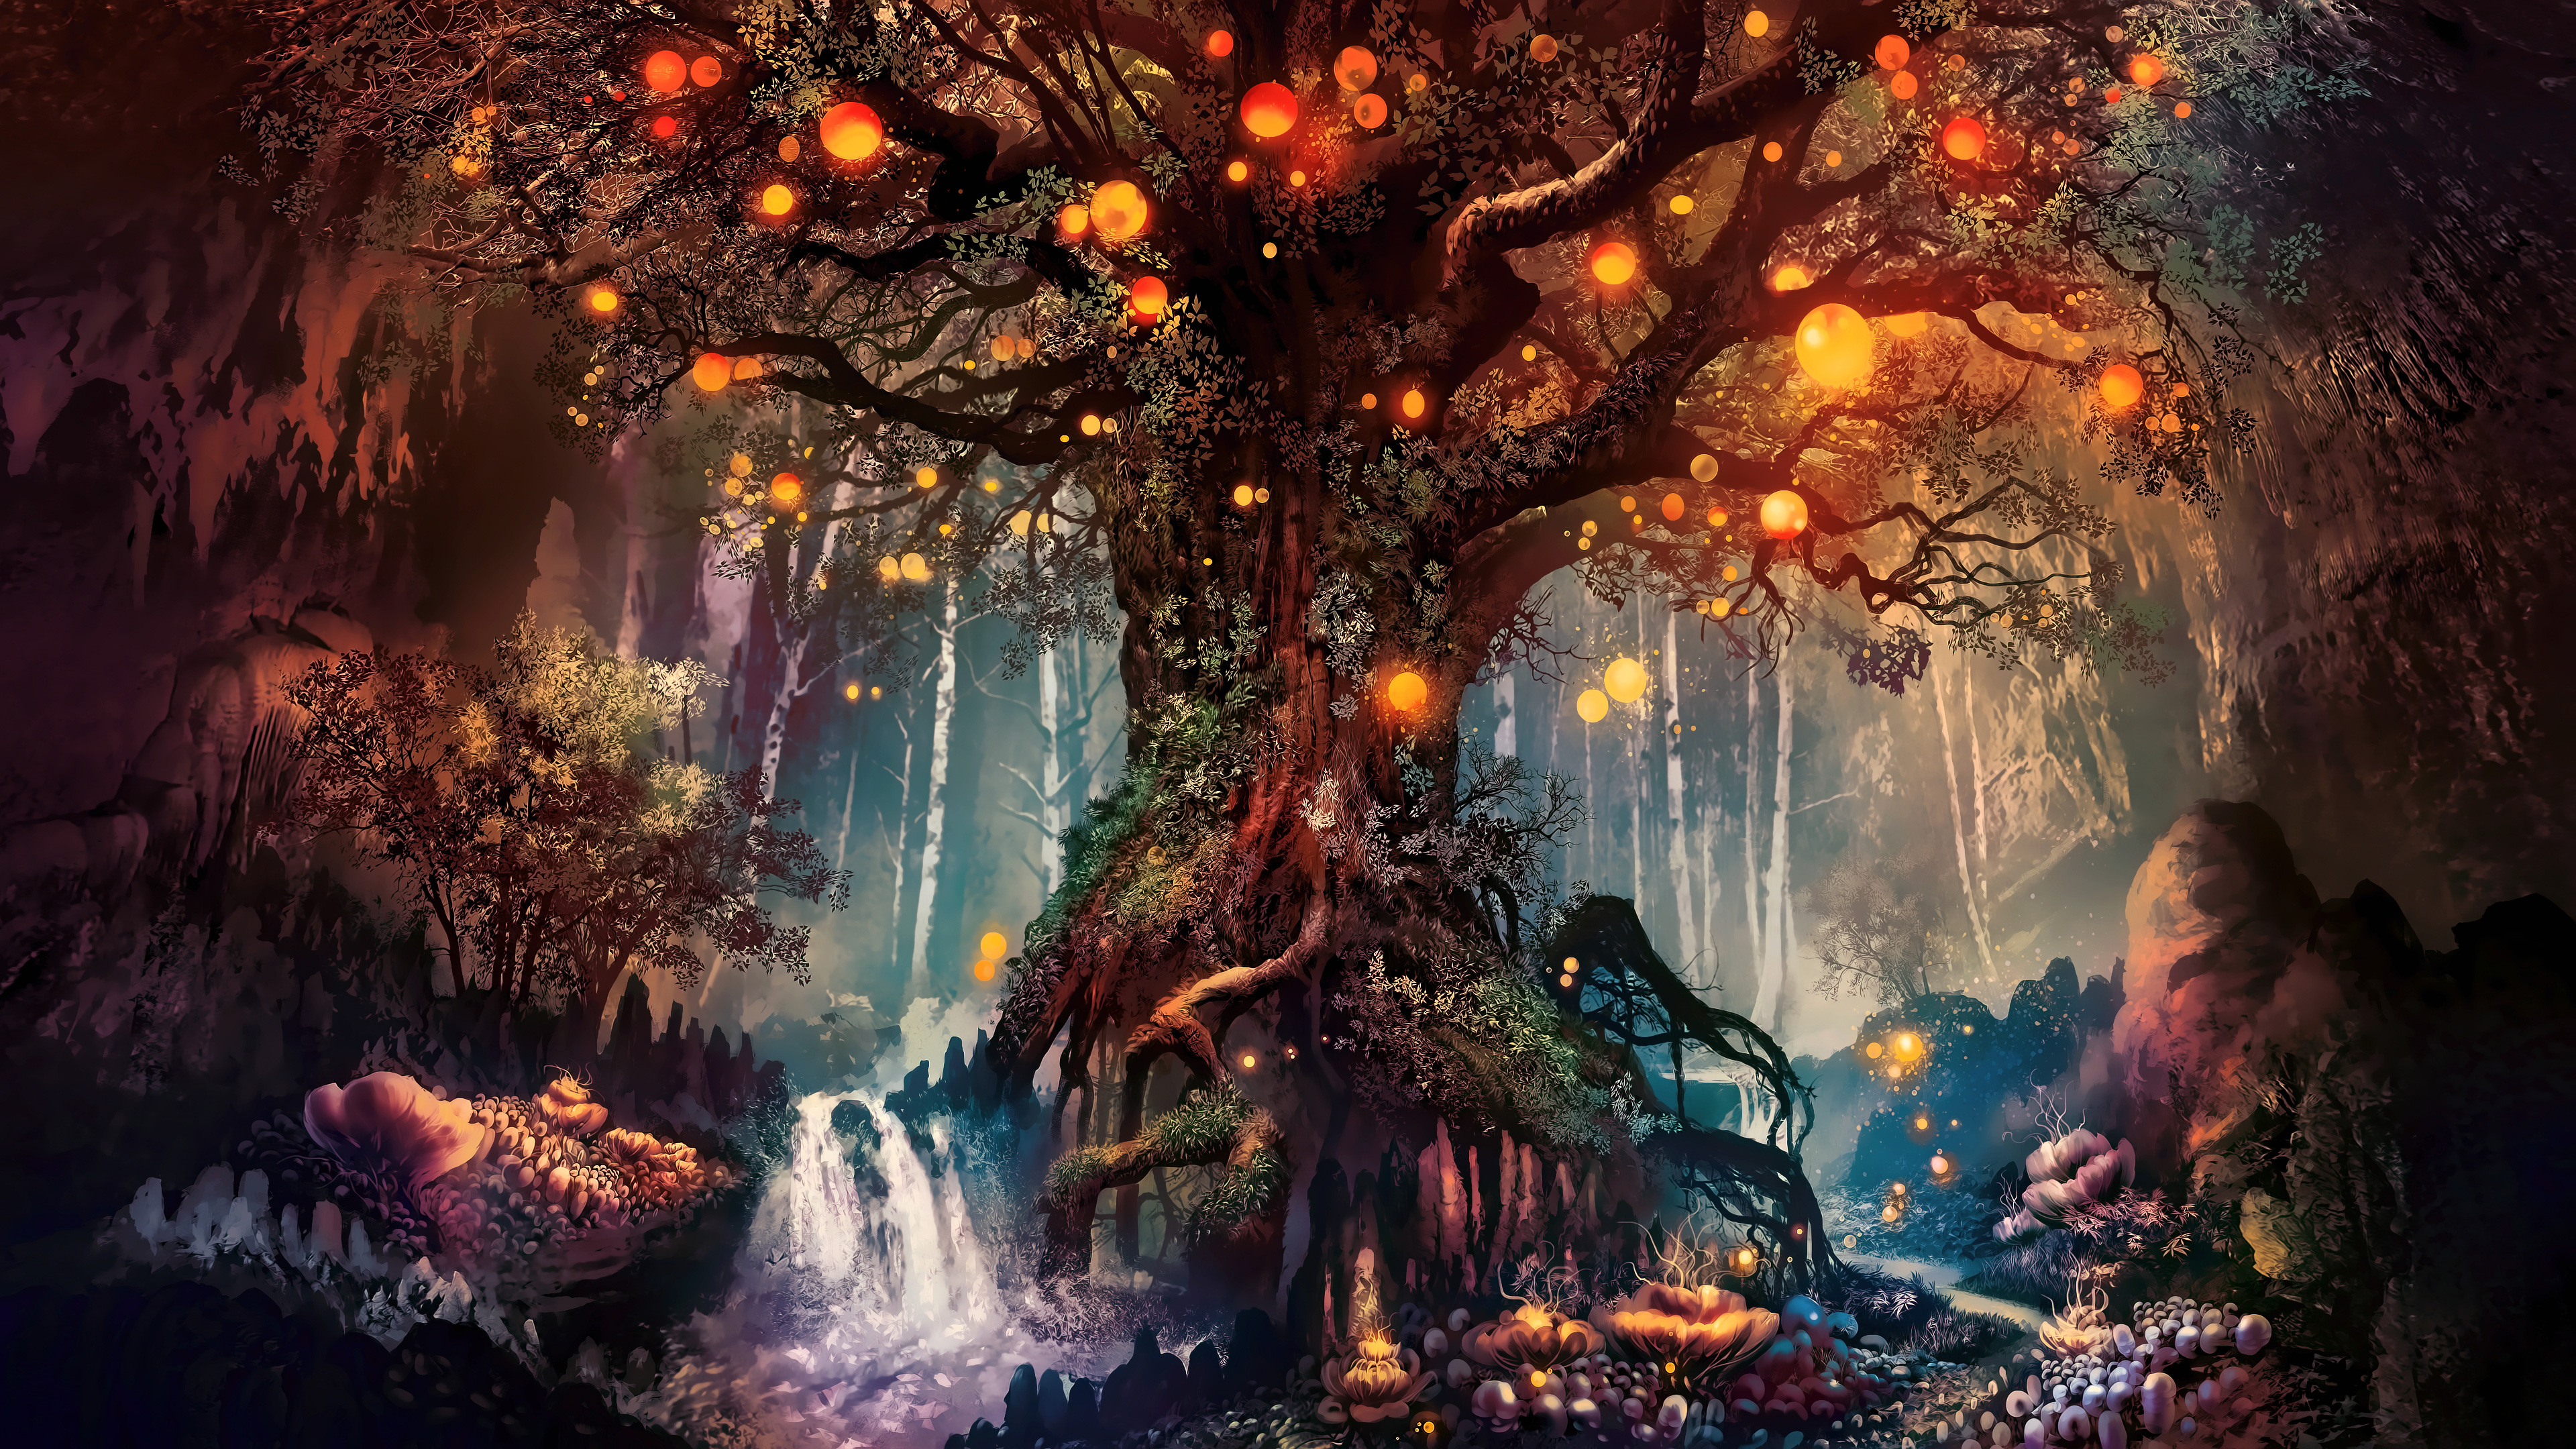 Hd Wallpapers Fantasy 79 Images: 3840x2160 Forest Fantasy Artwork 4k 4k HD 4k Wallpapers